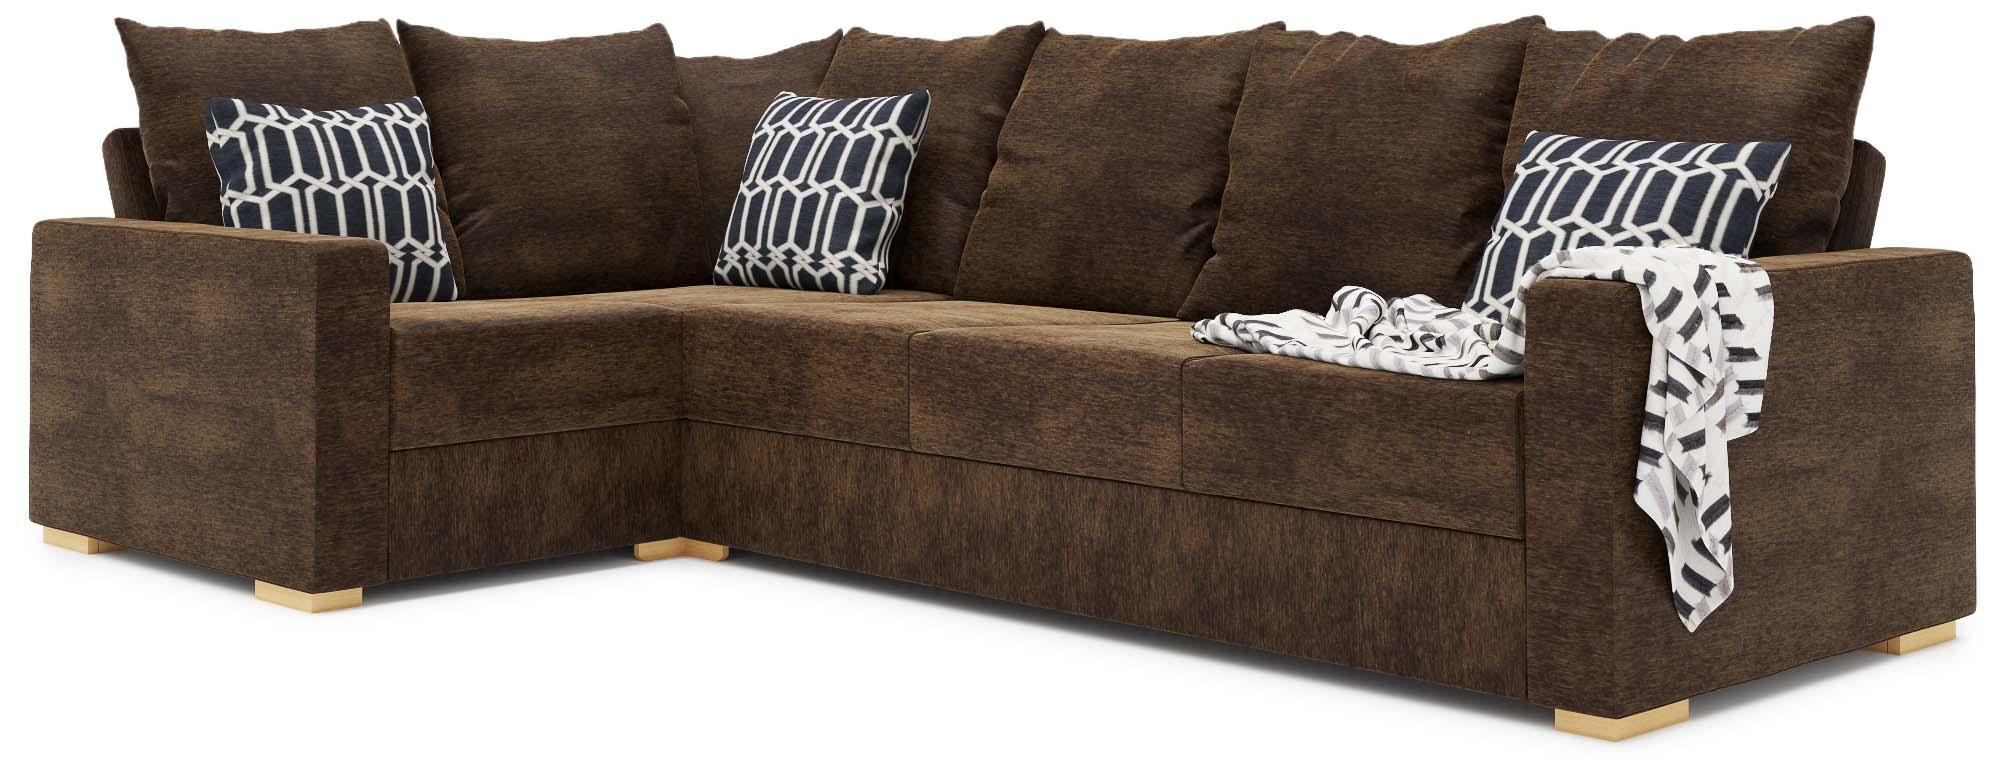 Tor 4X2 Corner Double Sofa Bed